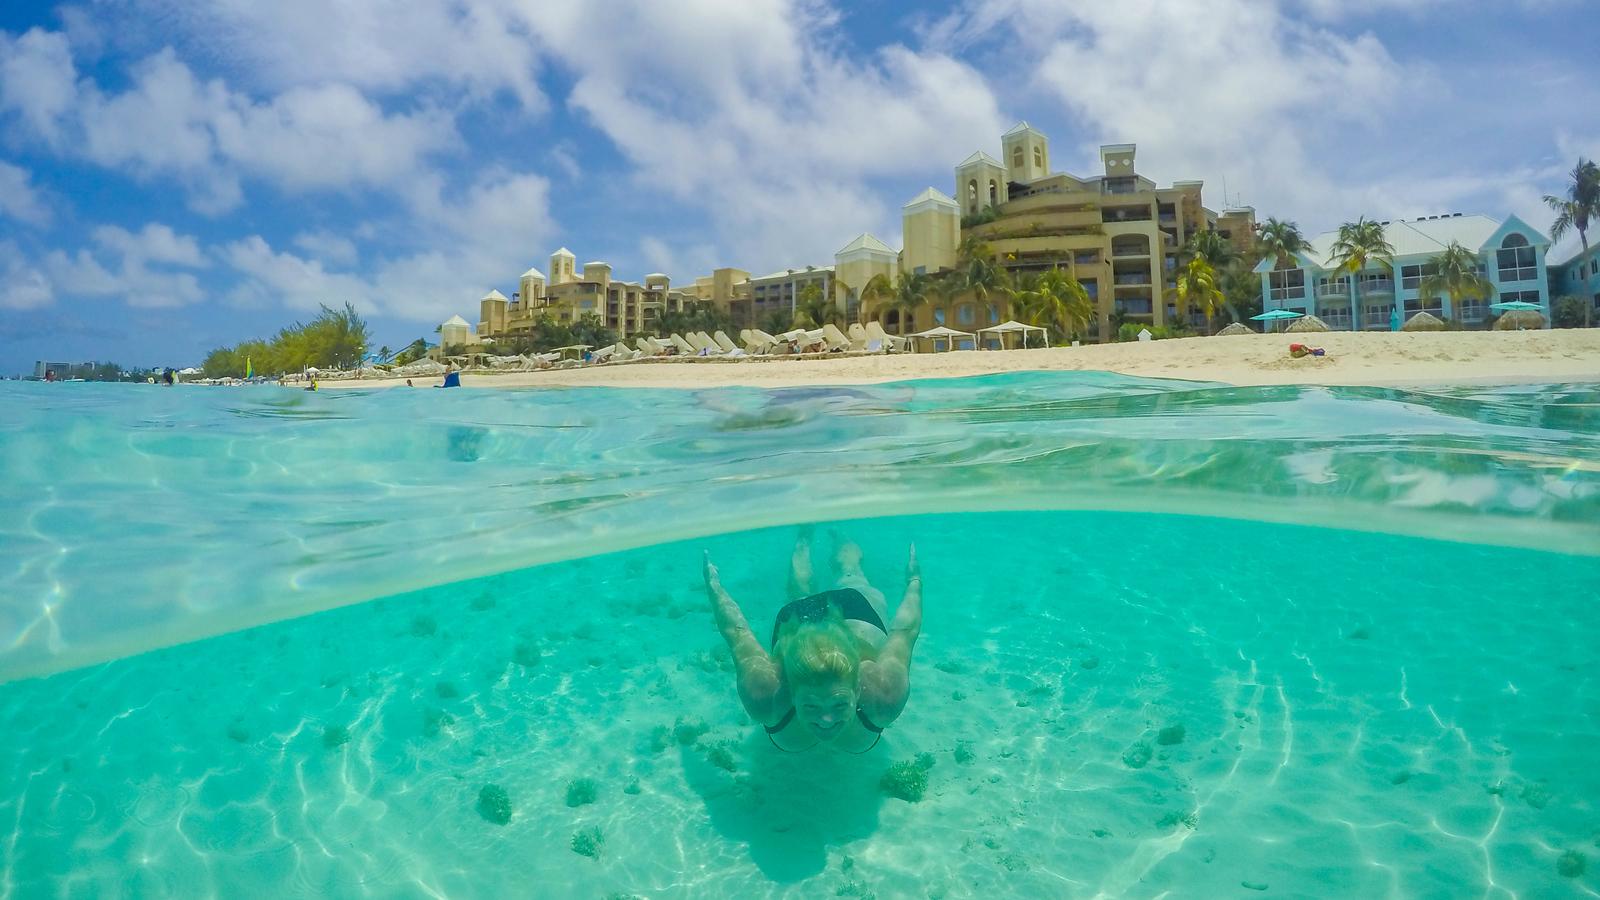 Underwater fun in Grand Cayman